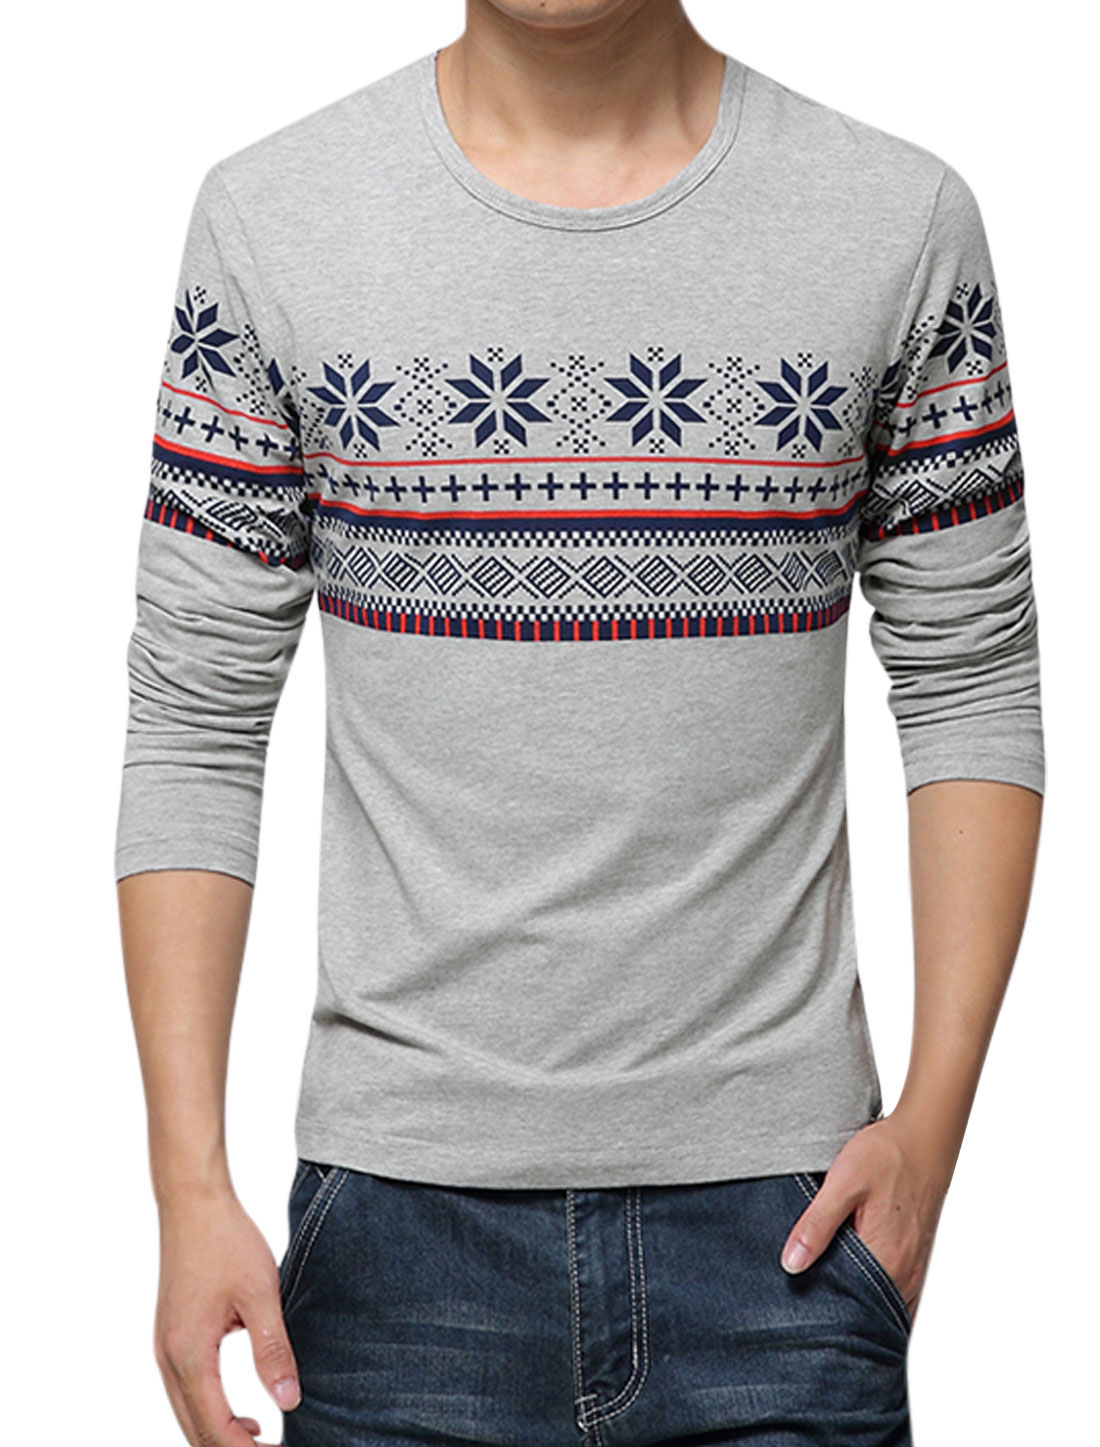 Men Long Sleeves Geometric Prints Slipover Casual Tops Gray M